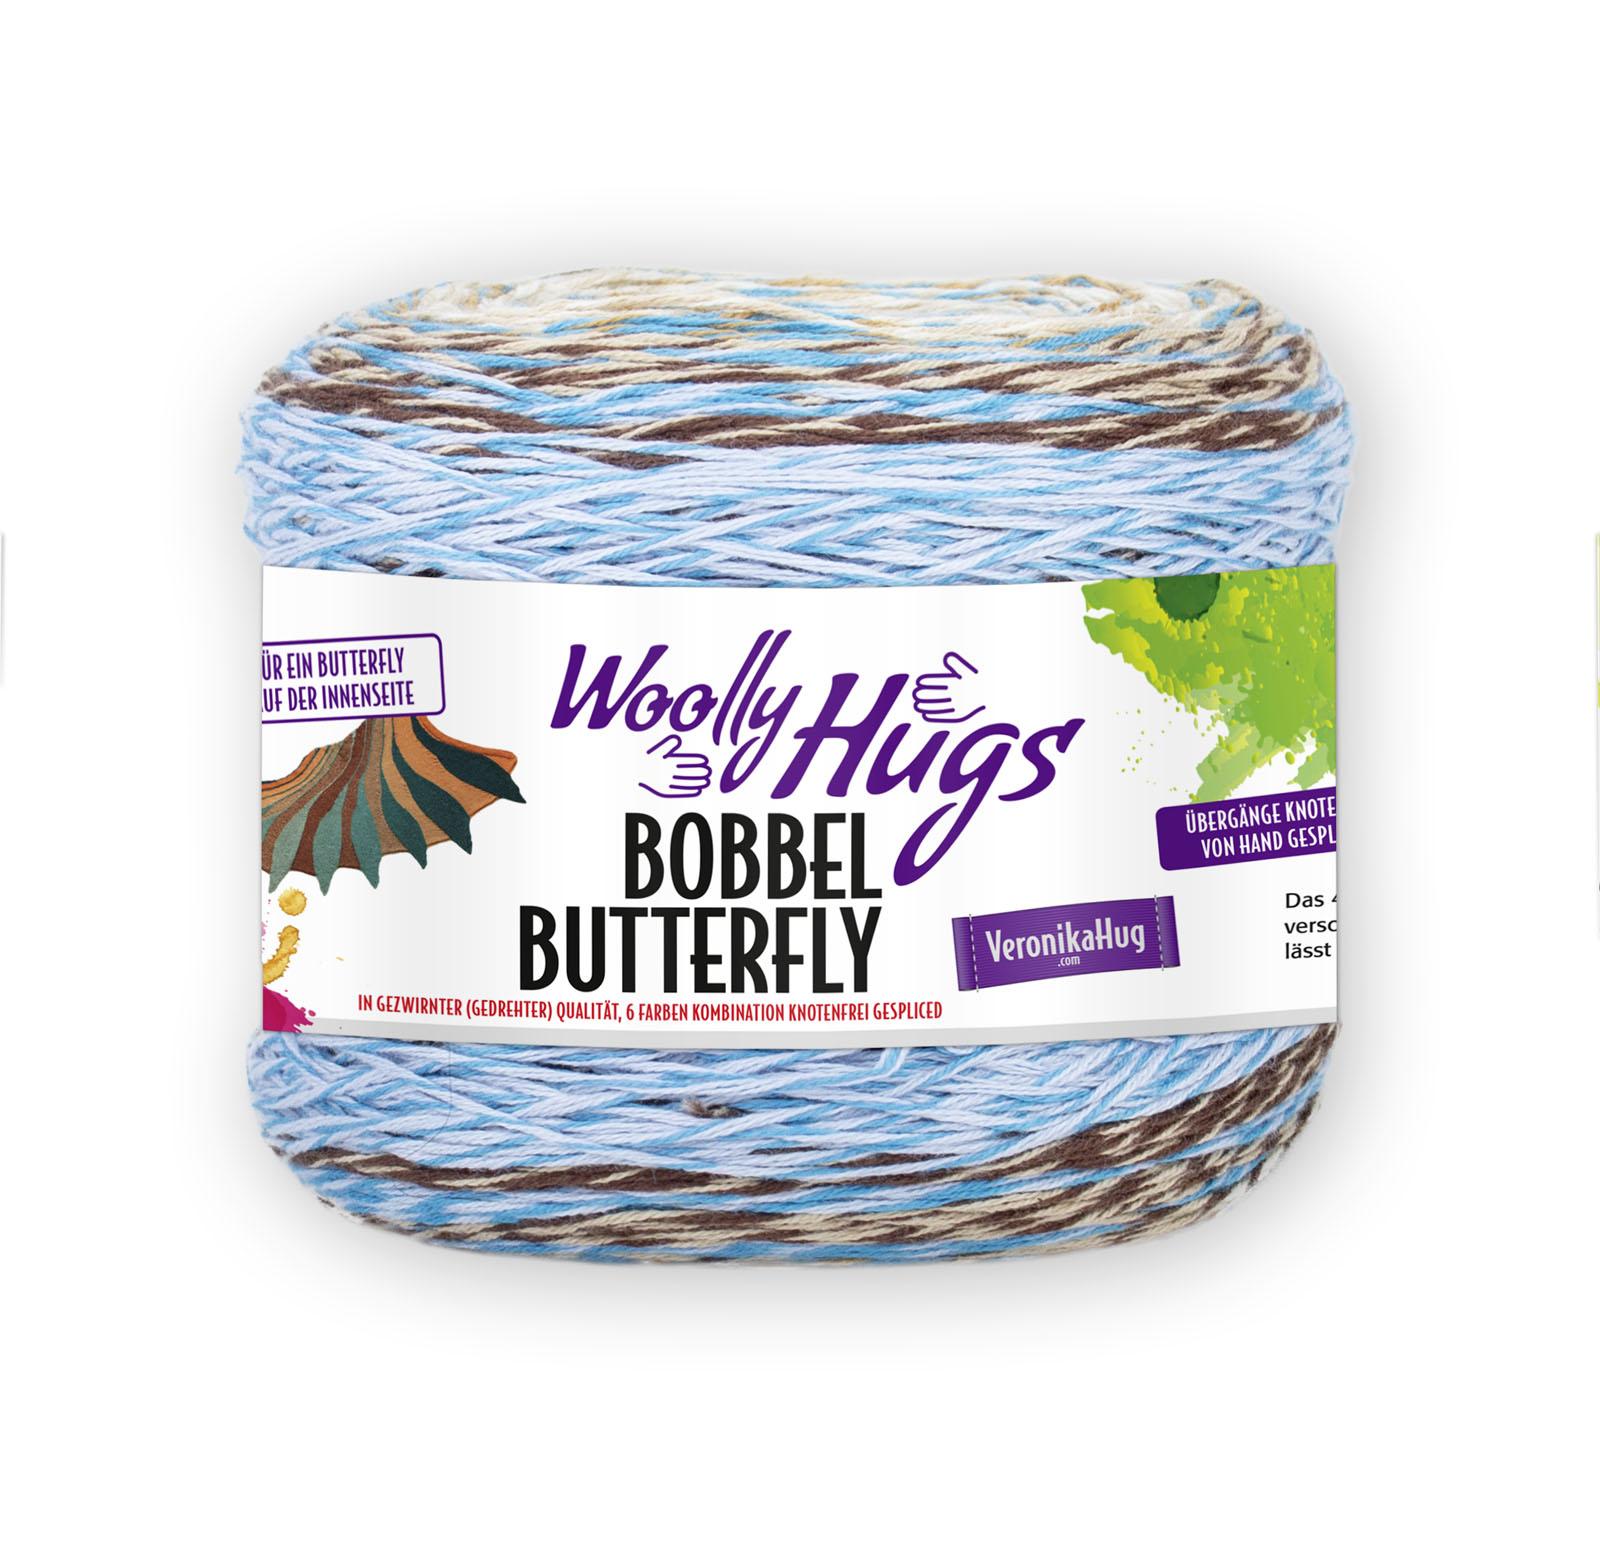 BOBBEL Butterfly 200g   1kg